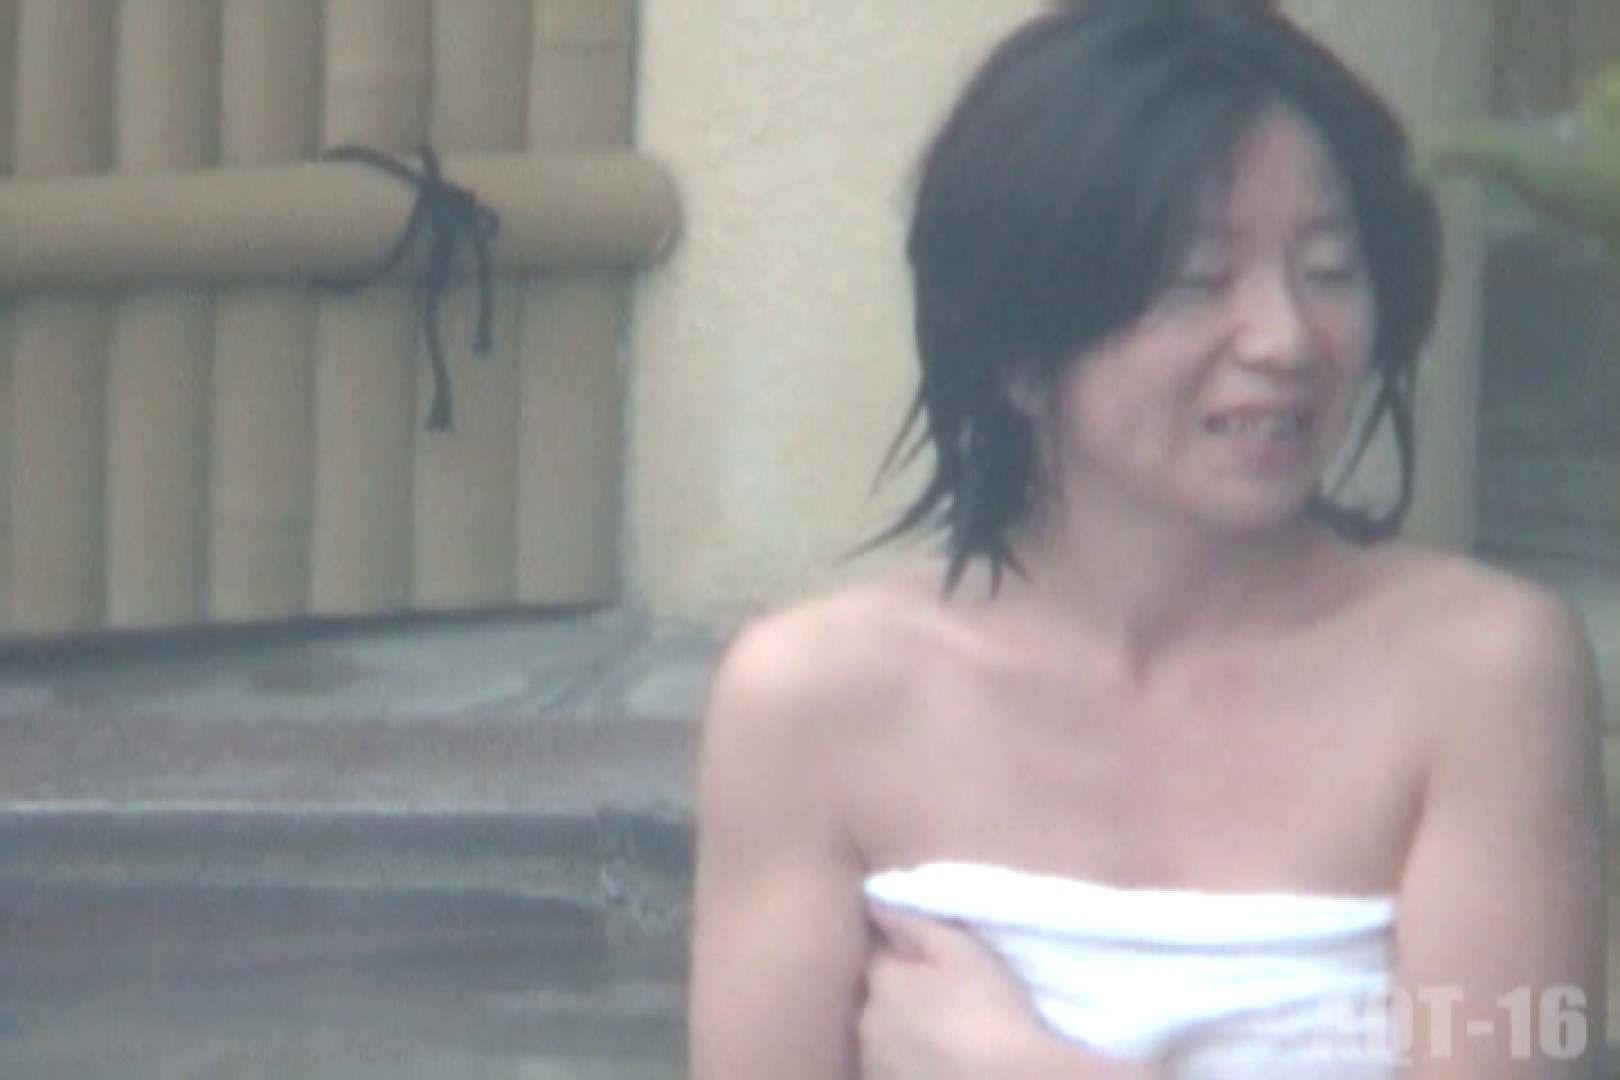 Aquaな露天風呂Vol.841 露天 のぞき動画キャプチャ 86pic 7